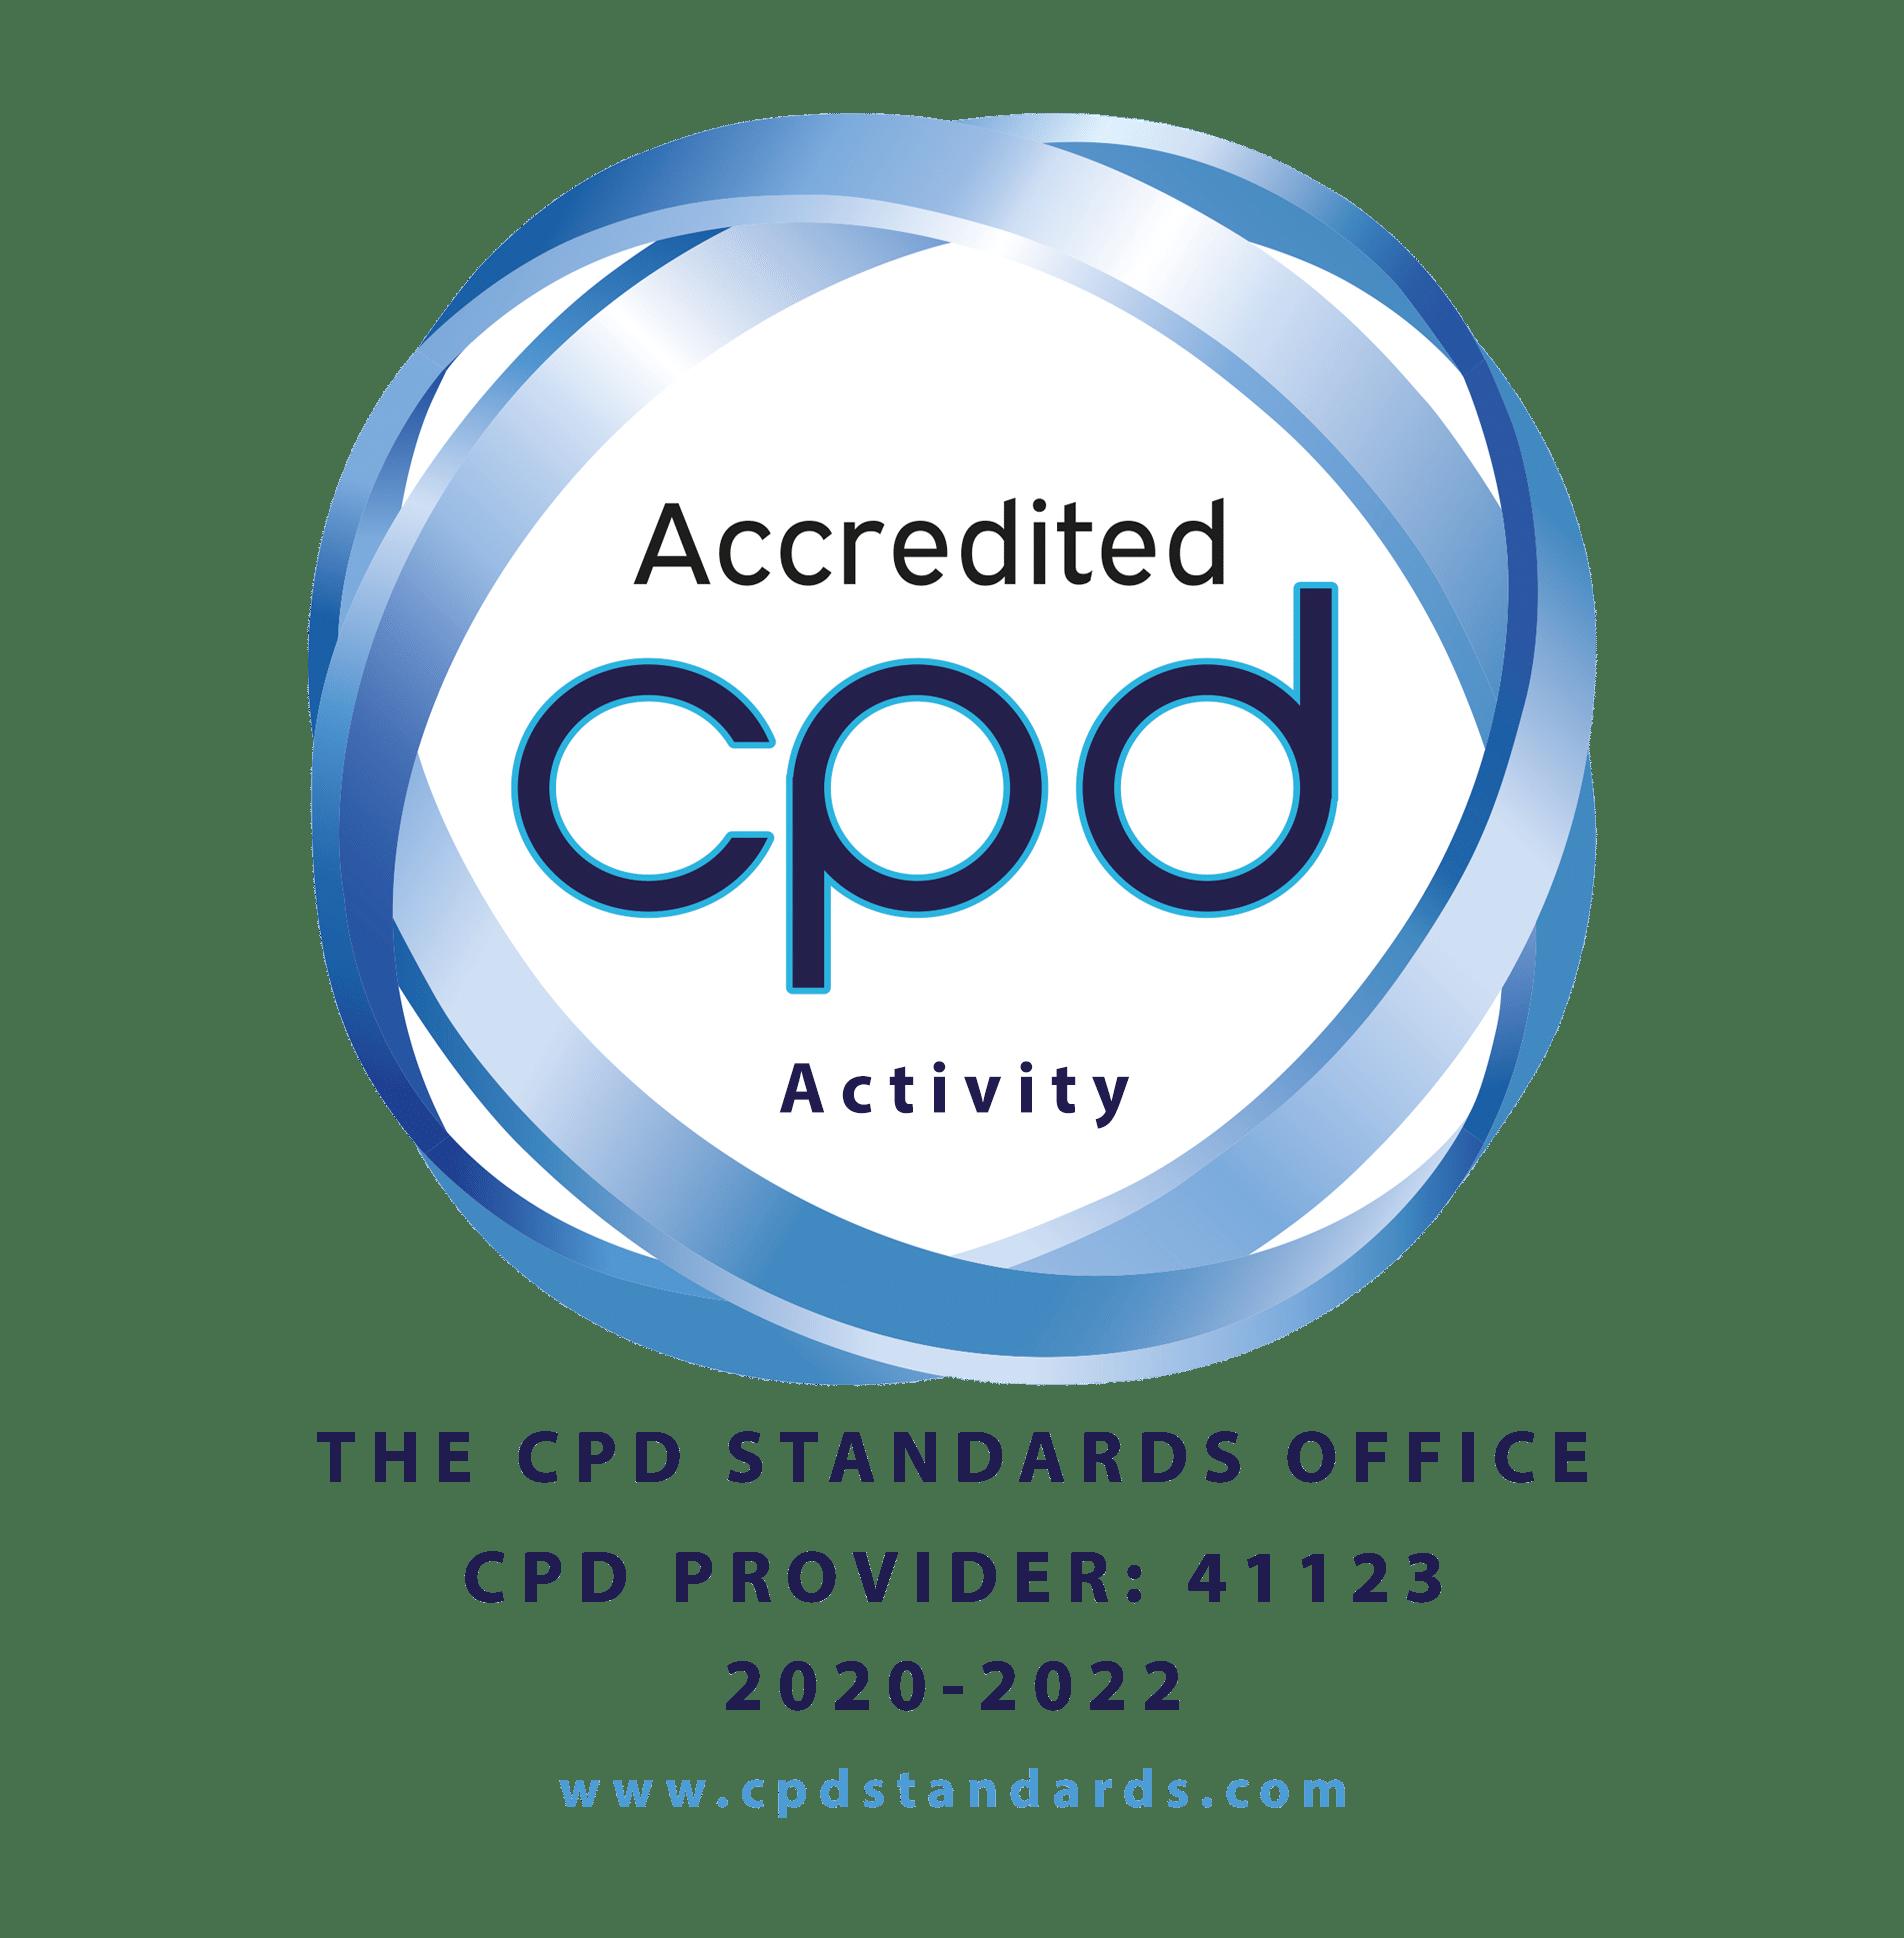 CPD Provider Logo Online Activity 2020 - 2022 - 41123